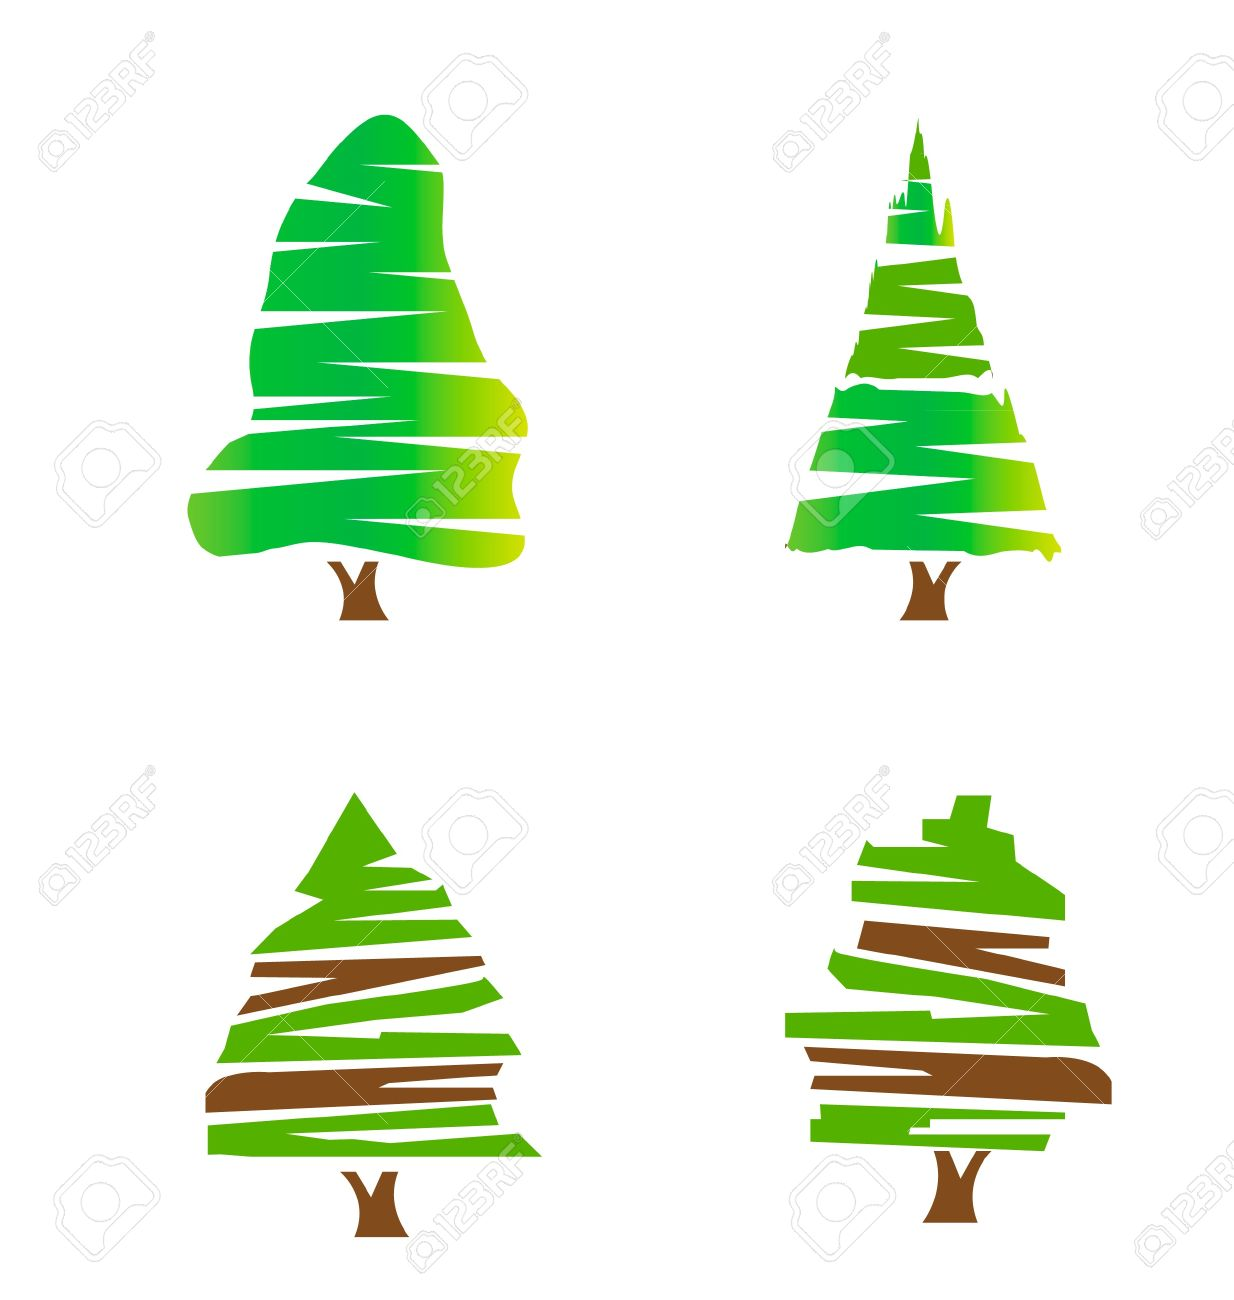 Set of green trees logo stock Stock Vector - 13855657